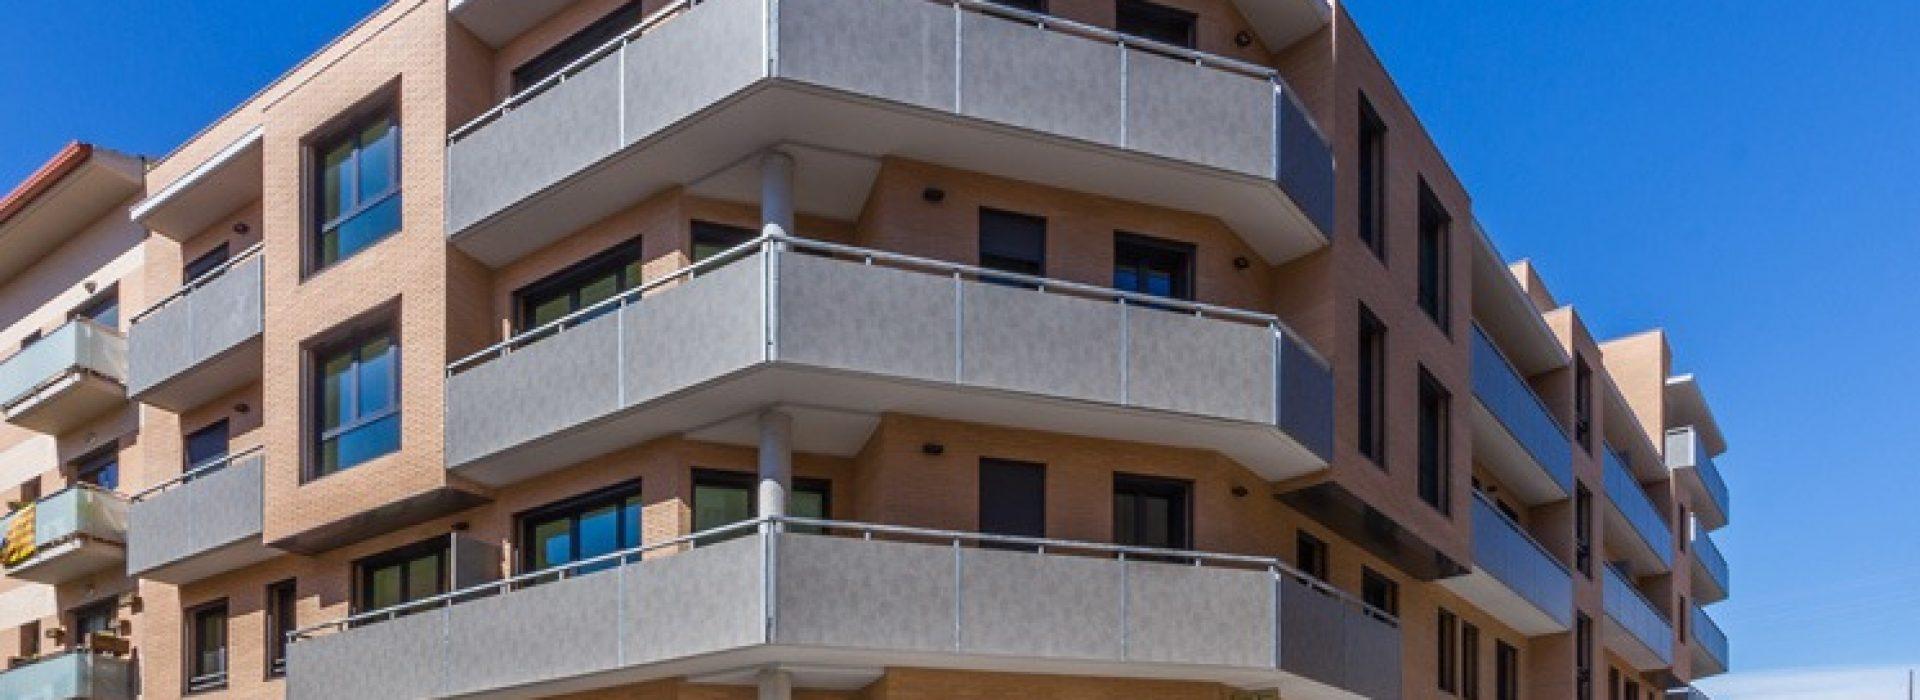 residencial-mas-marot01